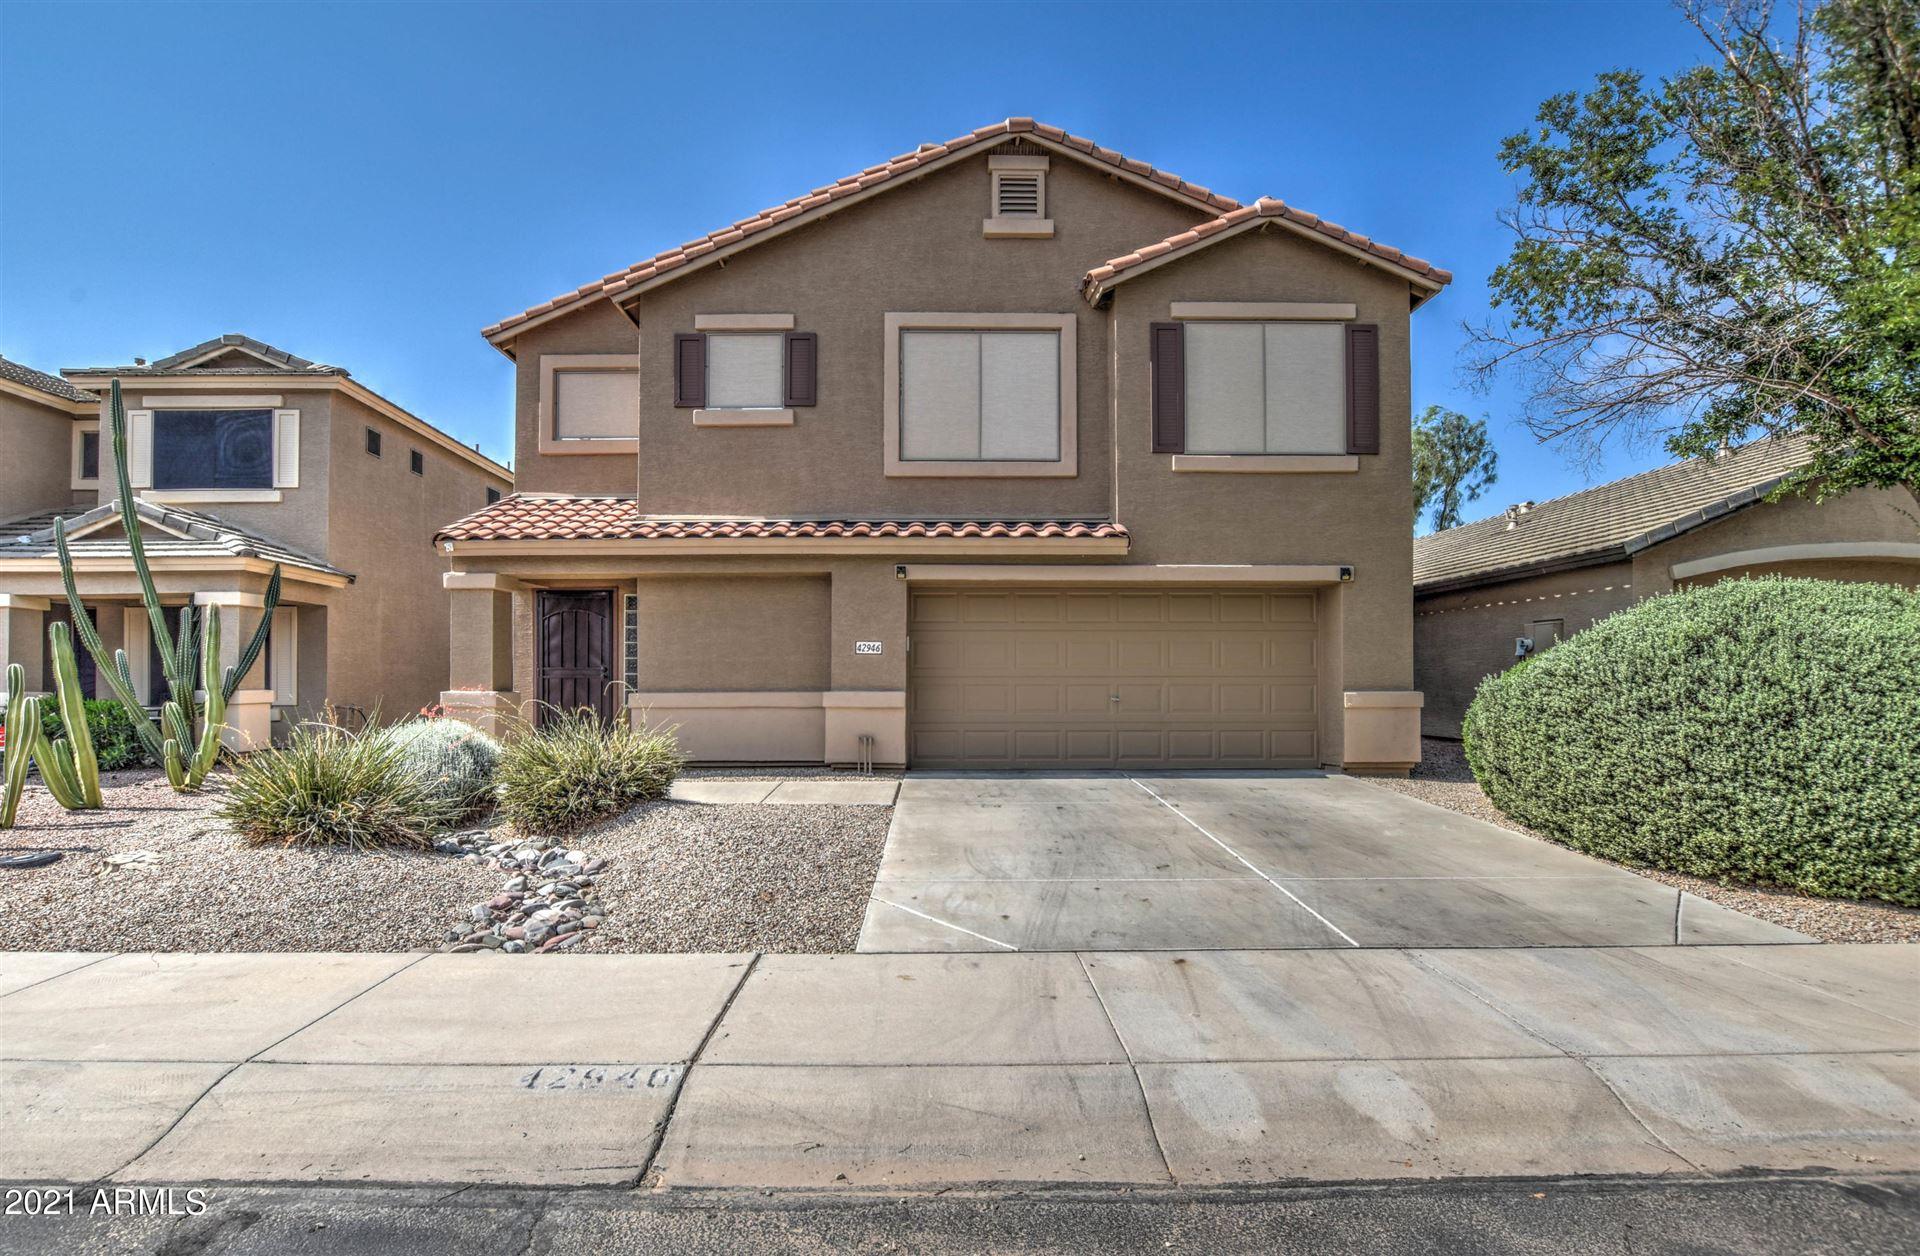 Photo of 42946 W ANNE Lane, Maricopa, AZ 85138 (MLS # 6268007)